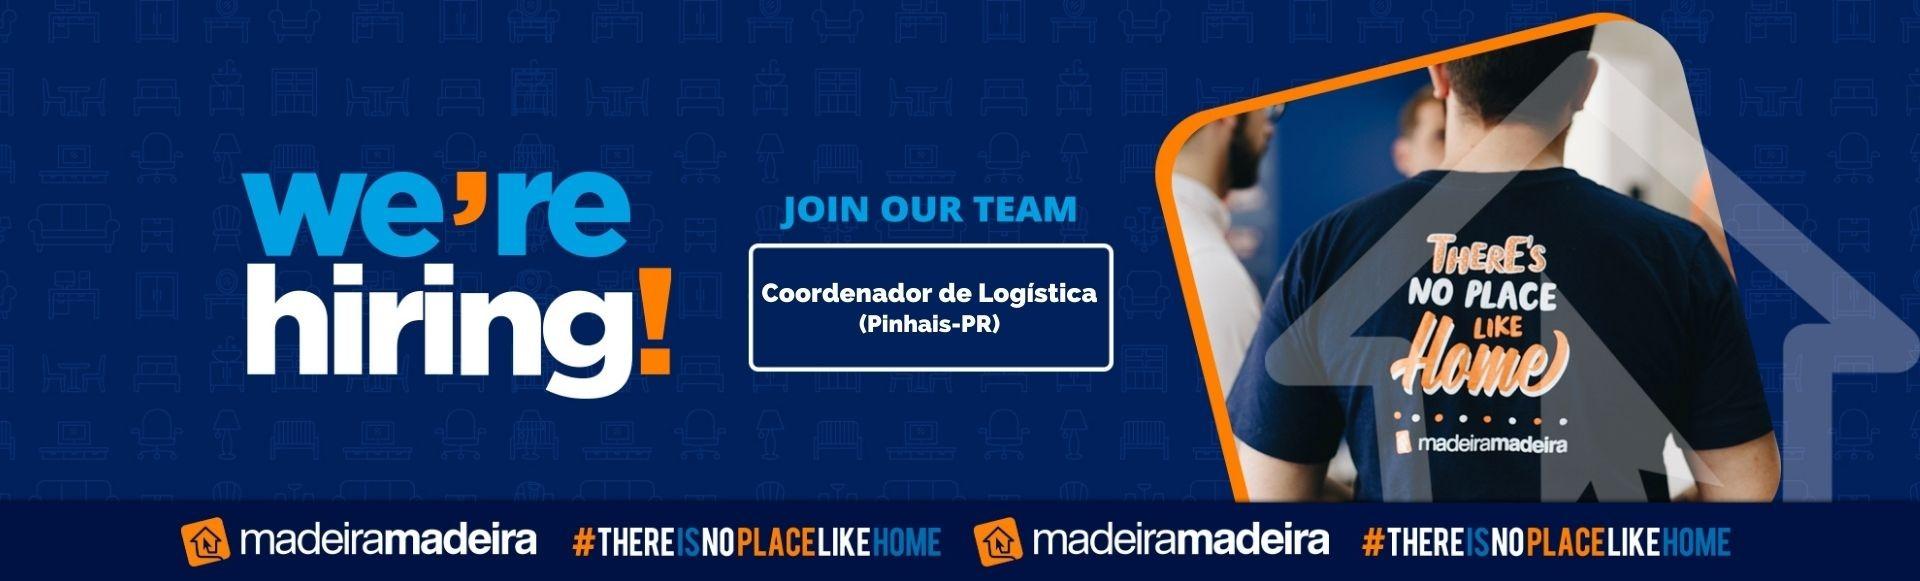 Coordenador de Logística (Pinhais-PR)